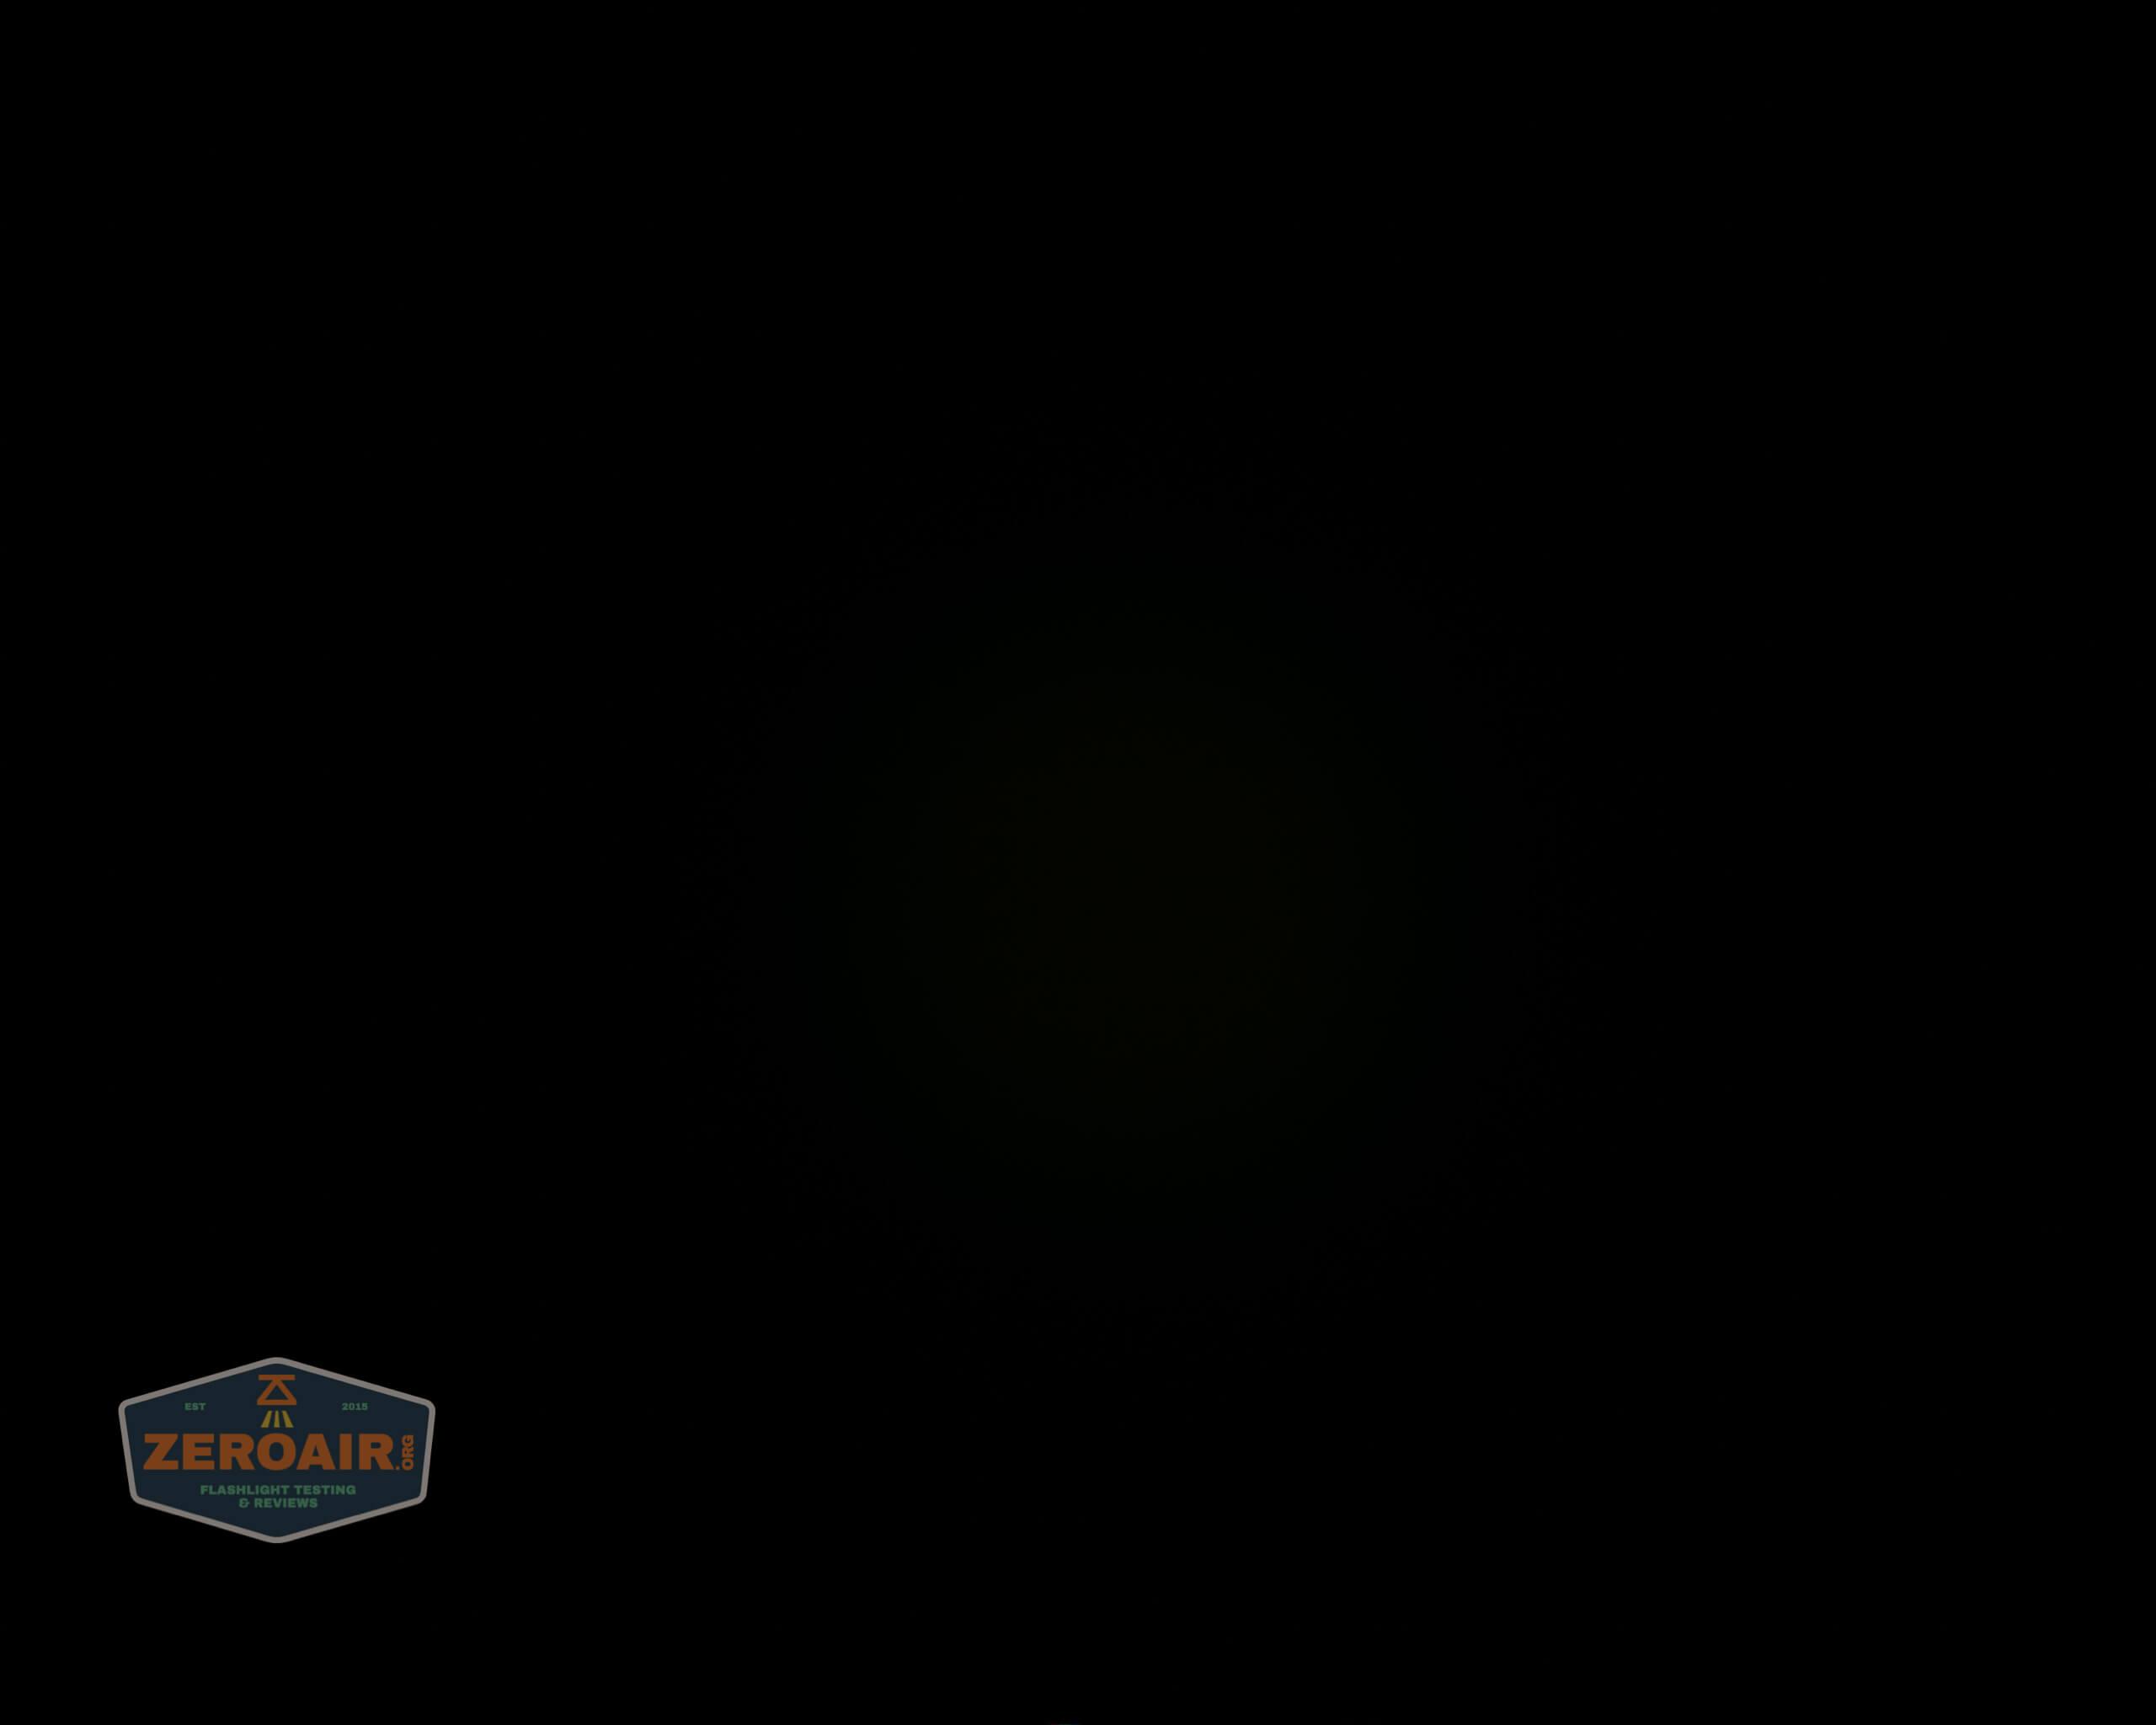 wurkkos fc11 flashlight beamshot ceiling 1